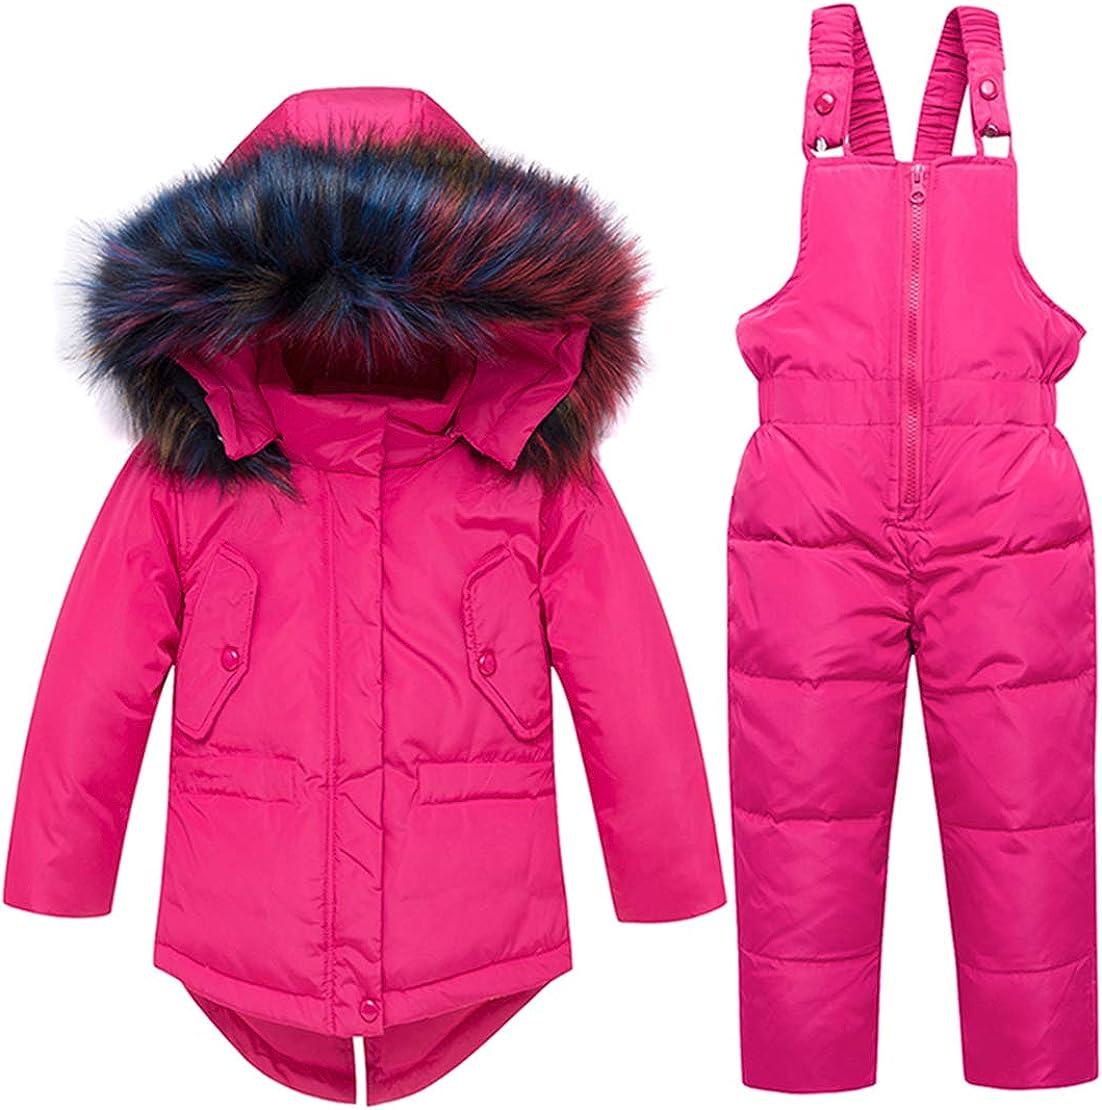 Hayisugar Unisex Baby Snowsuit Kids Puffer Winter Warm Snowsuit Jacket Hoodie Coat Down with Snow Down Bib Pants 2 Pieces Ski Outfit Set 1-5 Years